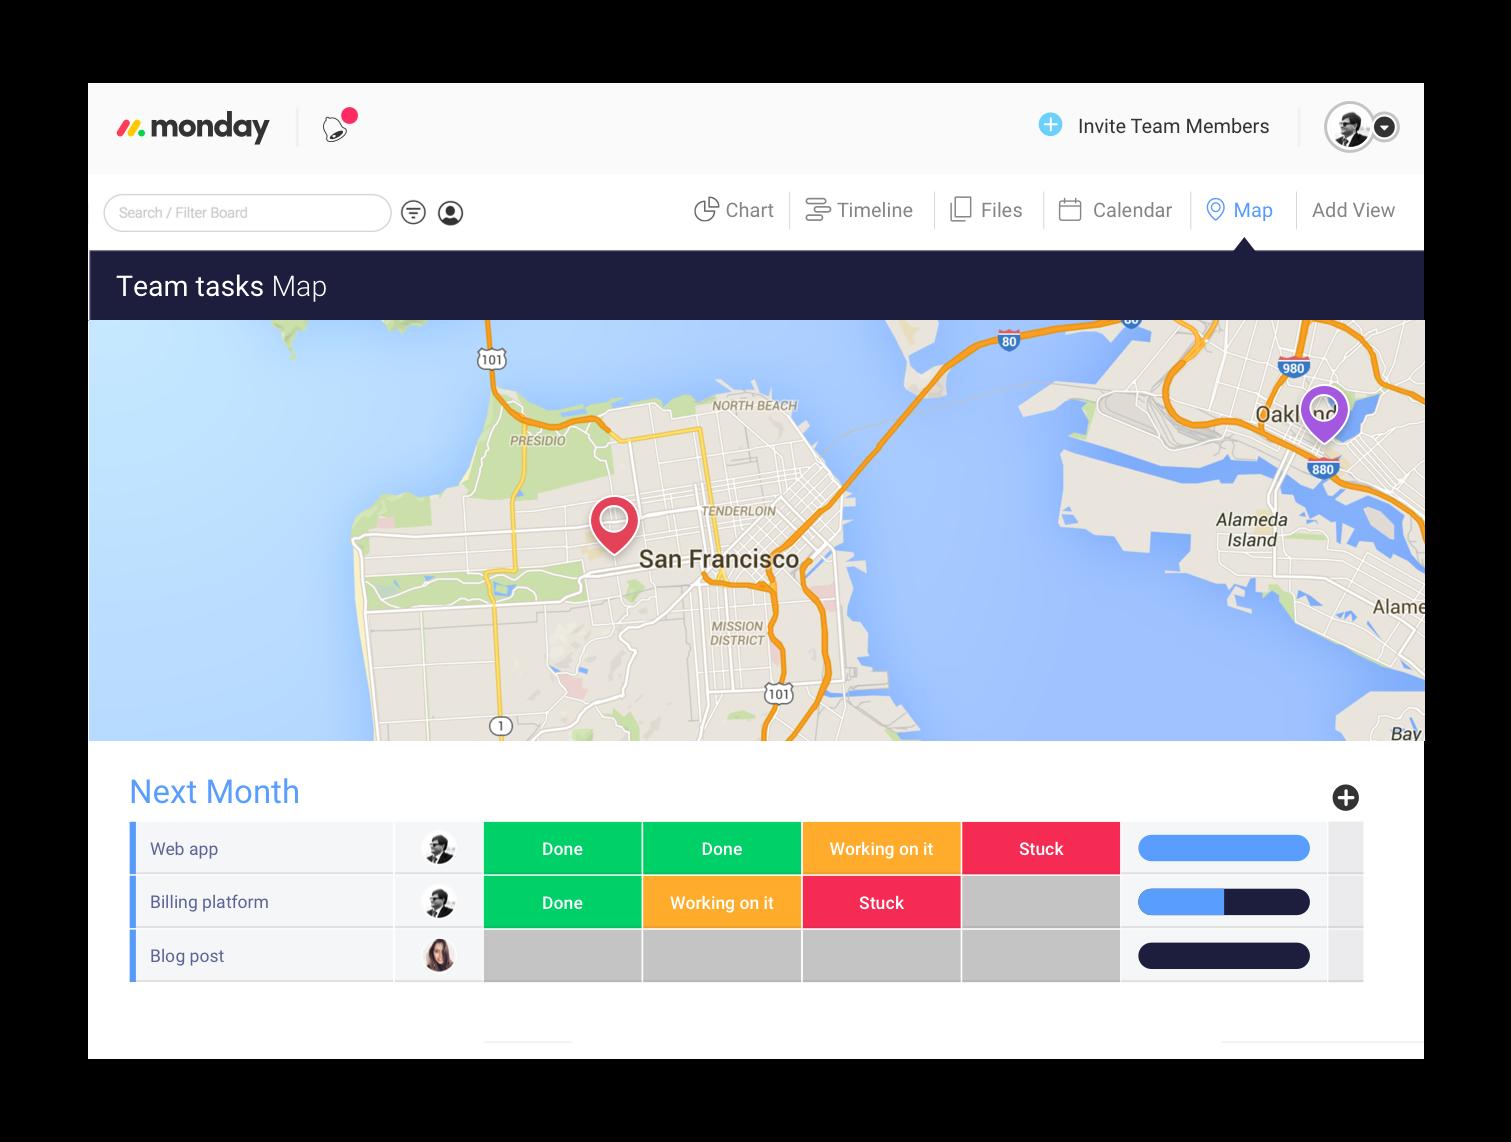 Photo of monday.com's team tasks map